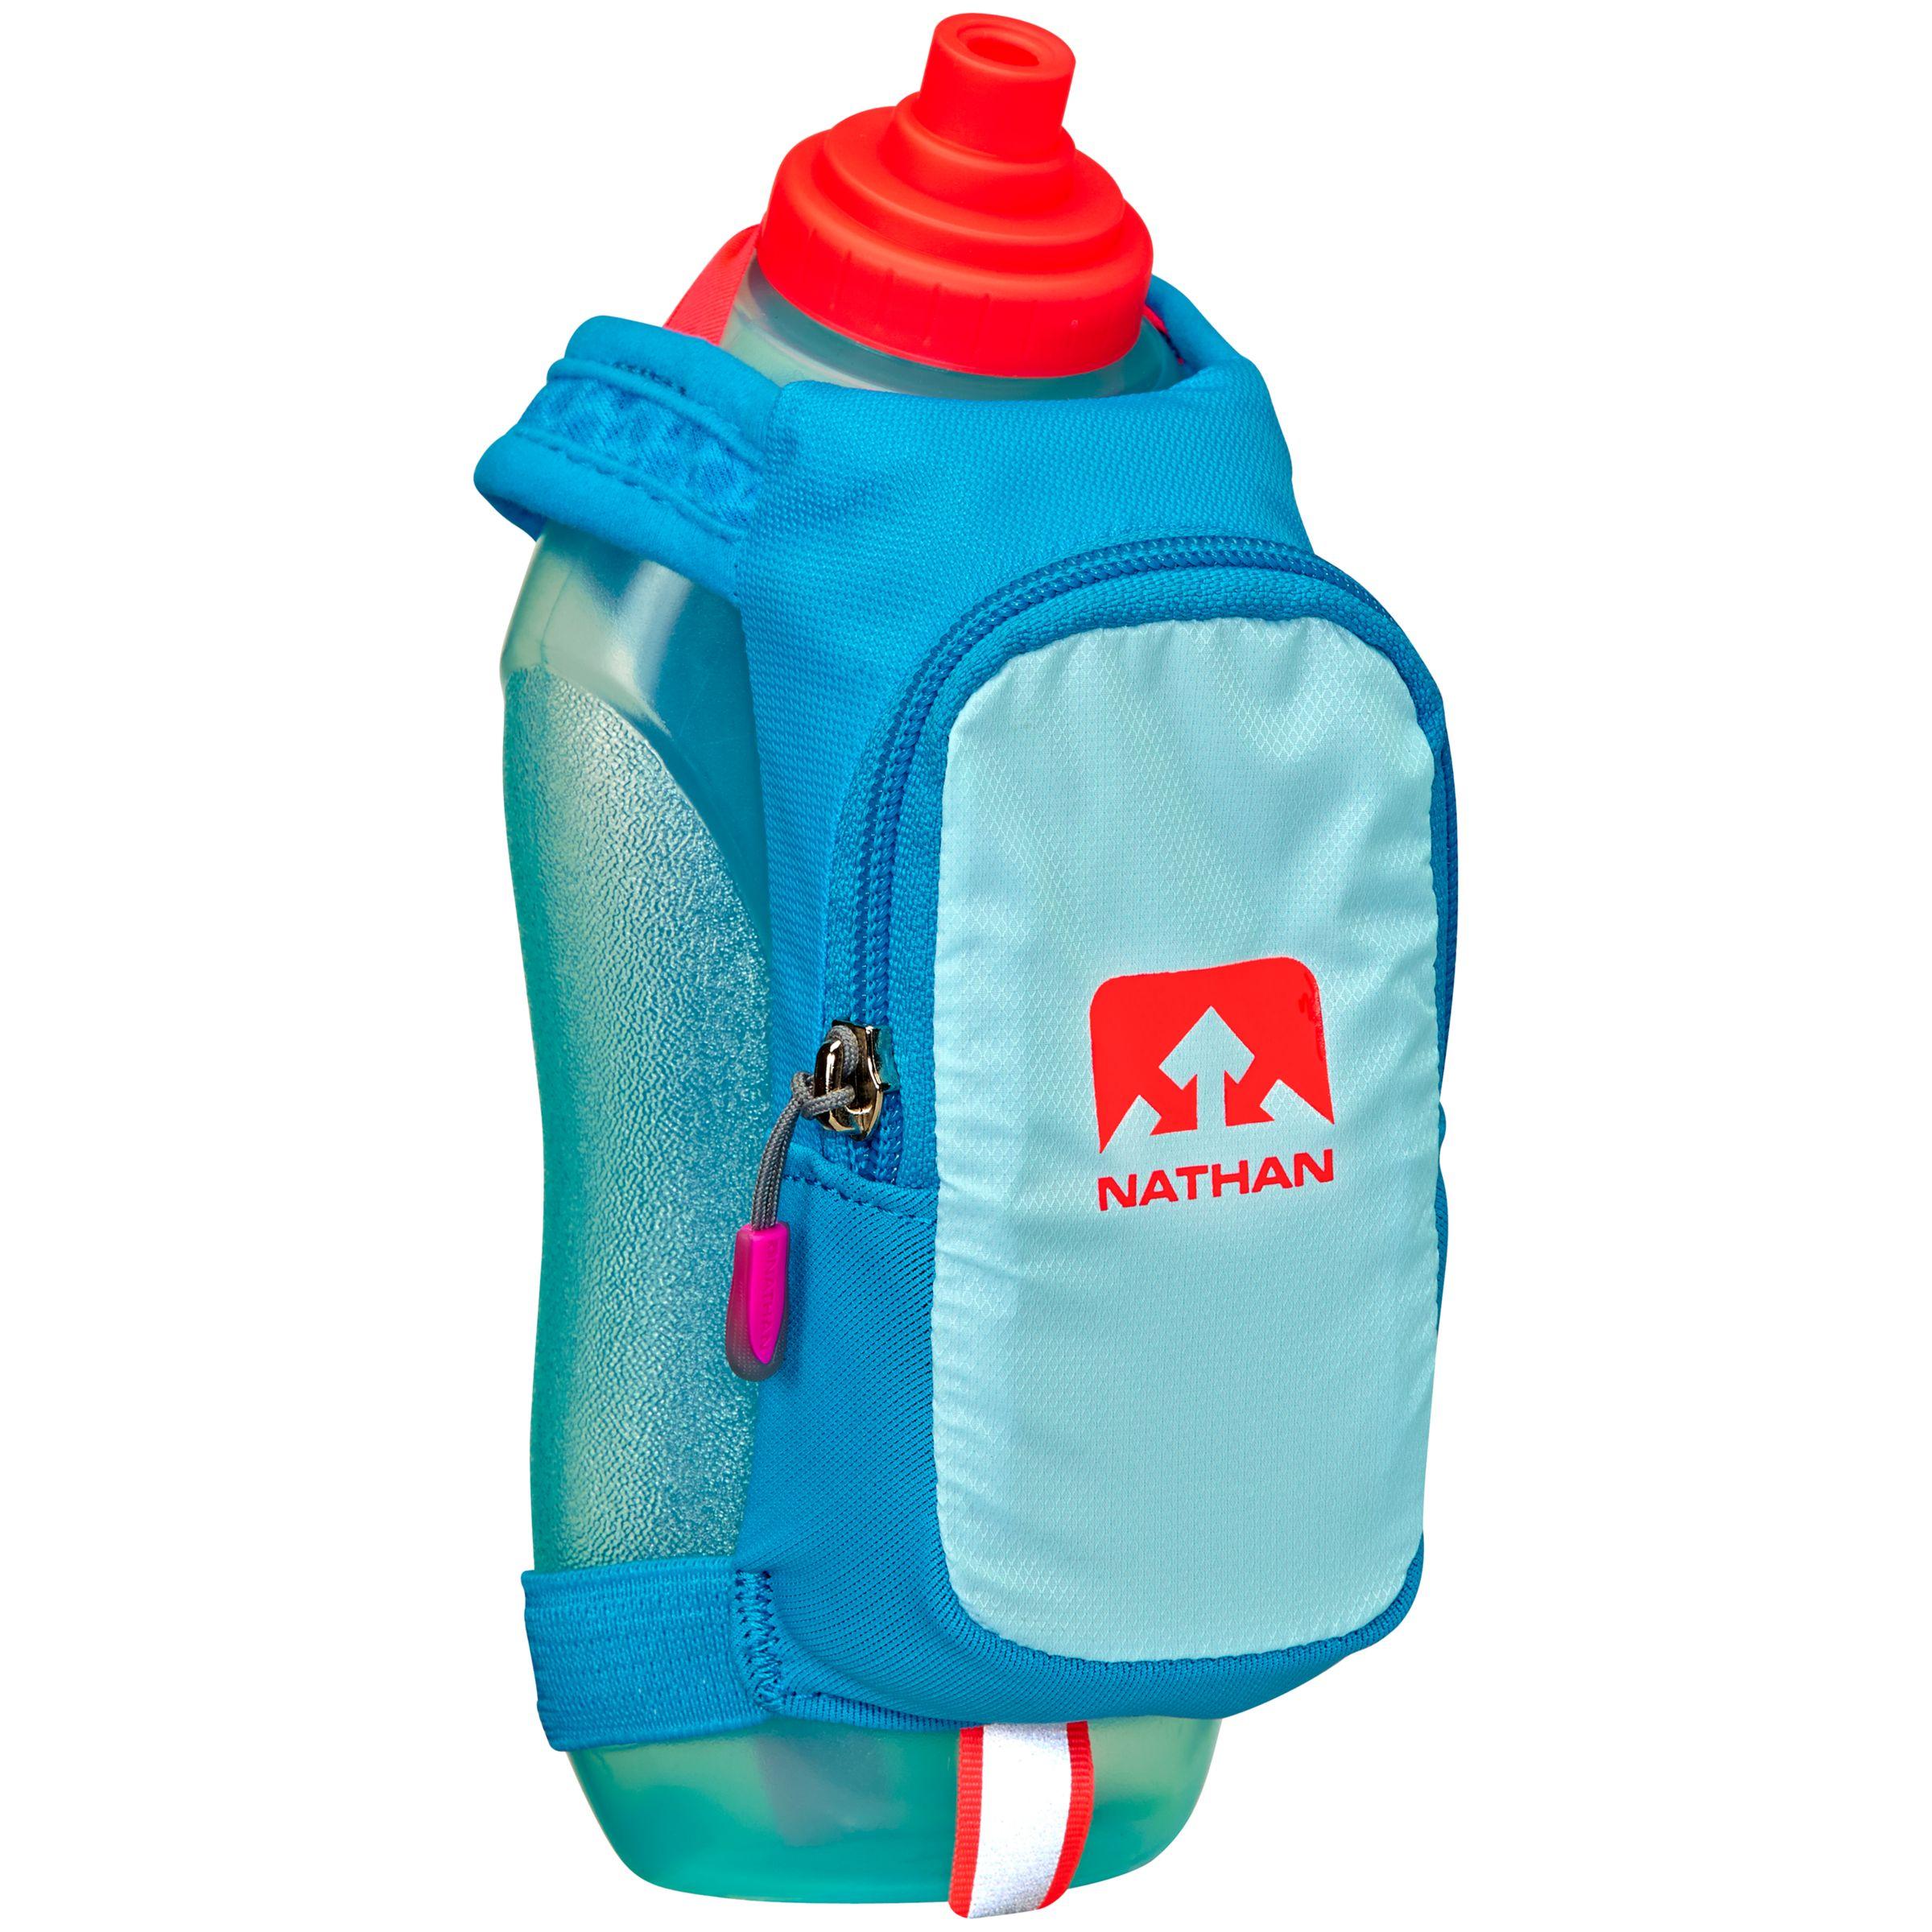 Nathan Nathan SpeedDraw Plus Insulated Handheld Flask, Light Blue